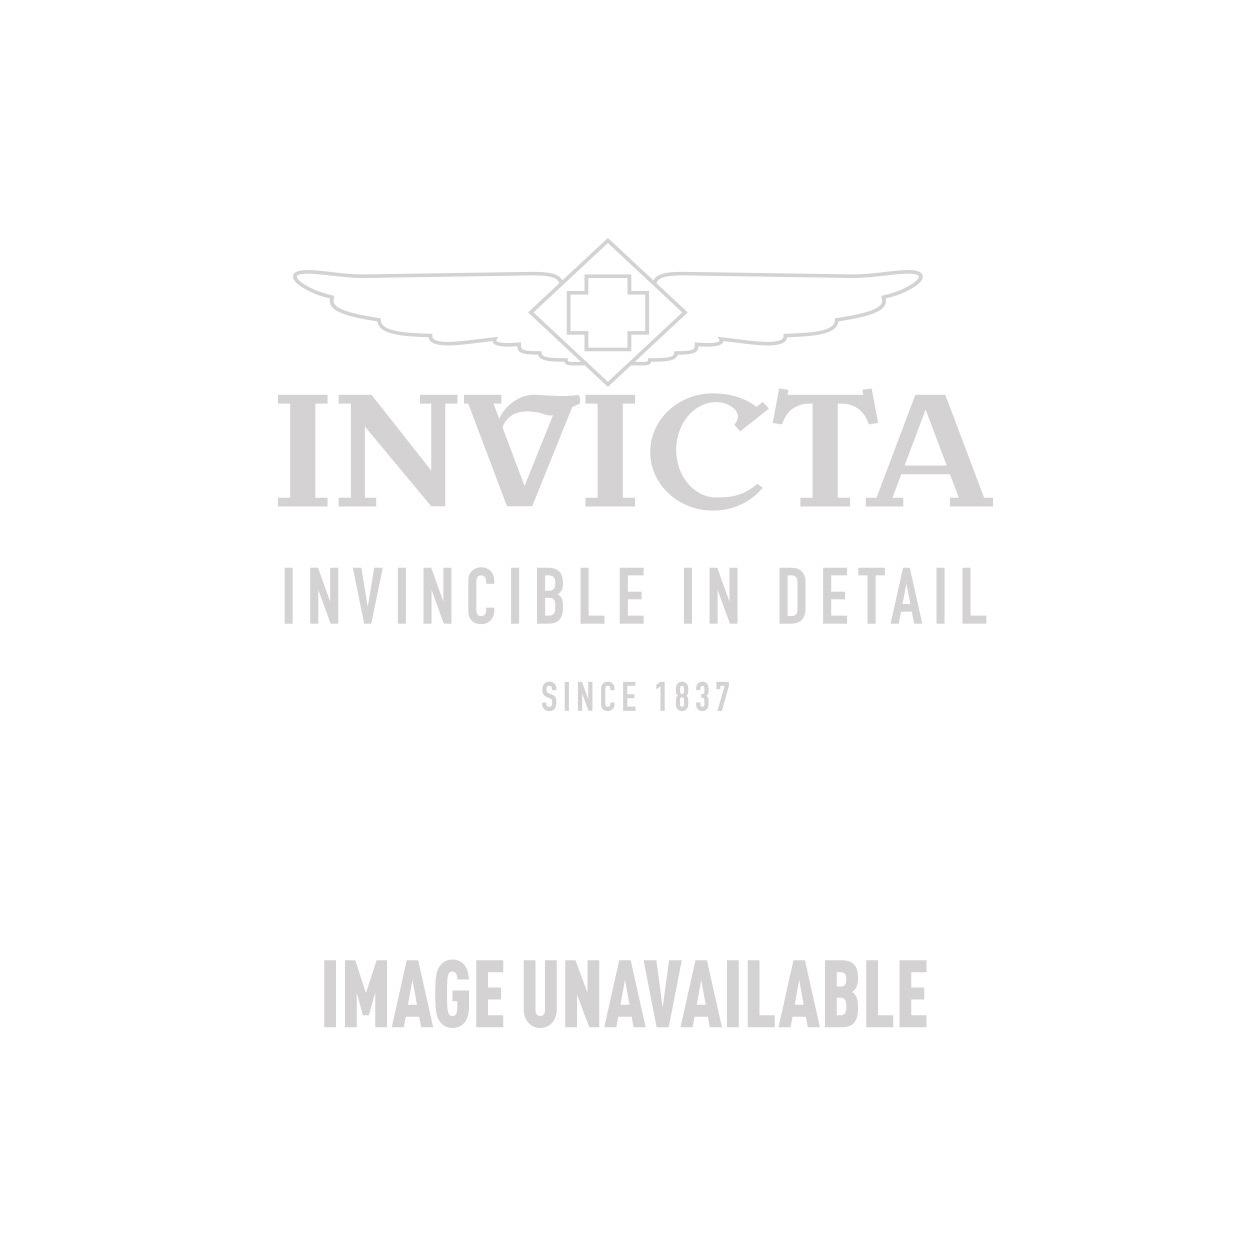 Invicta Corduba  Quartz Watch - Stainless Steel case with Black tone Nylon band - Model 12449